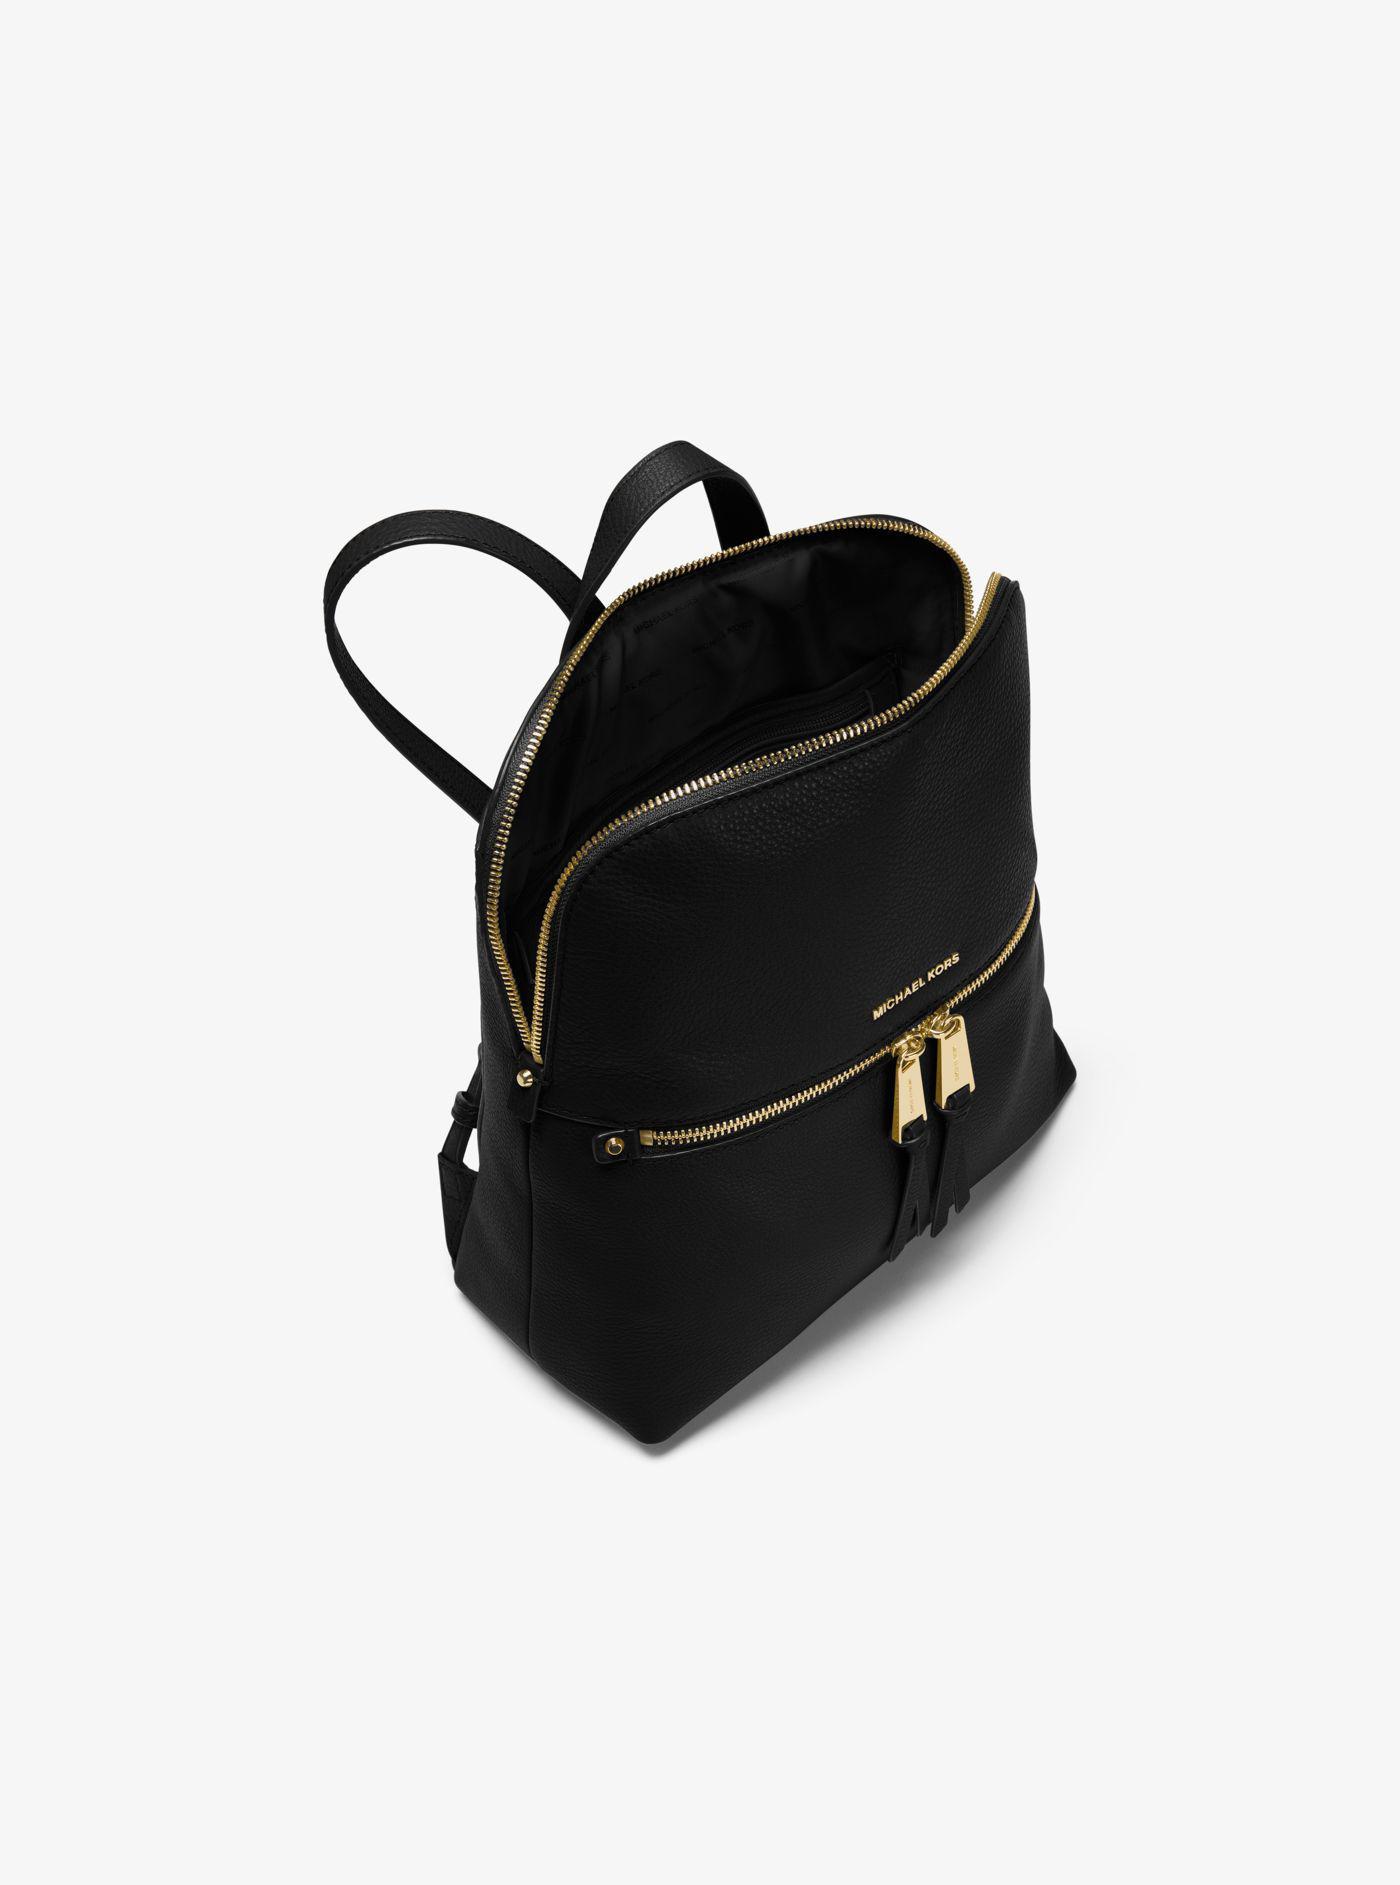 d53f6dc90945 Michael Kors - Black Rhea Medium Slim Leather Backpack - Lyst. View  fullscreen